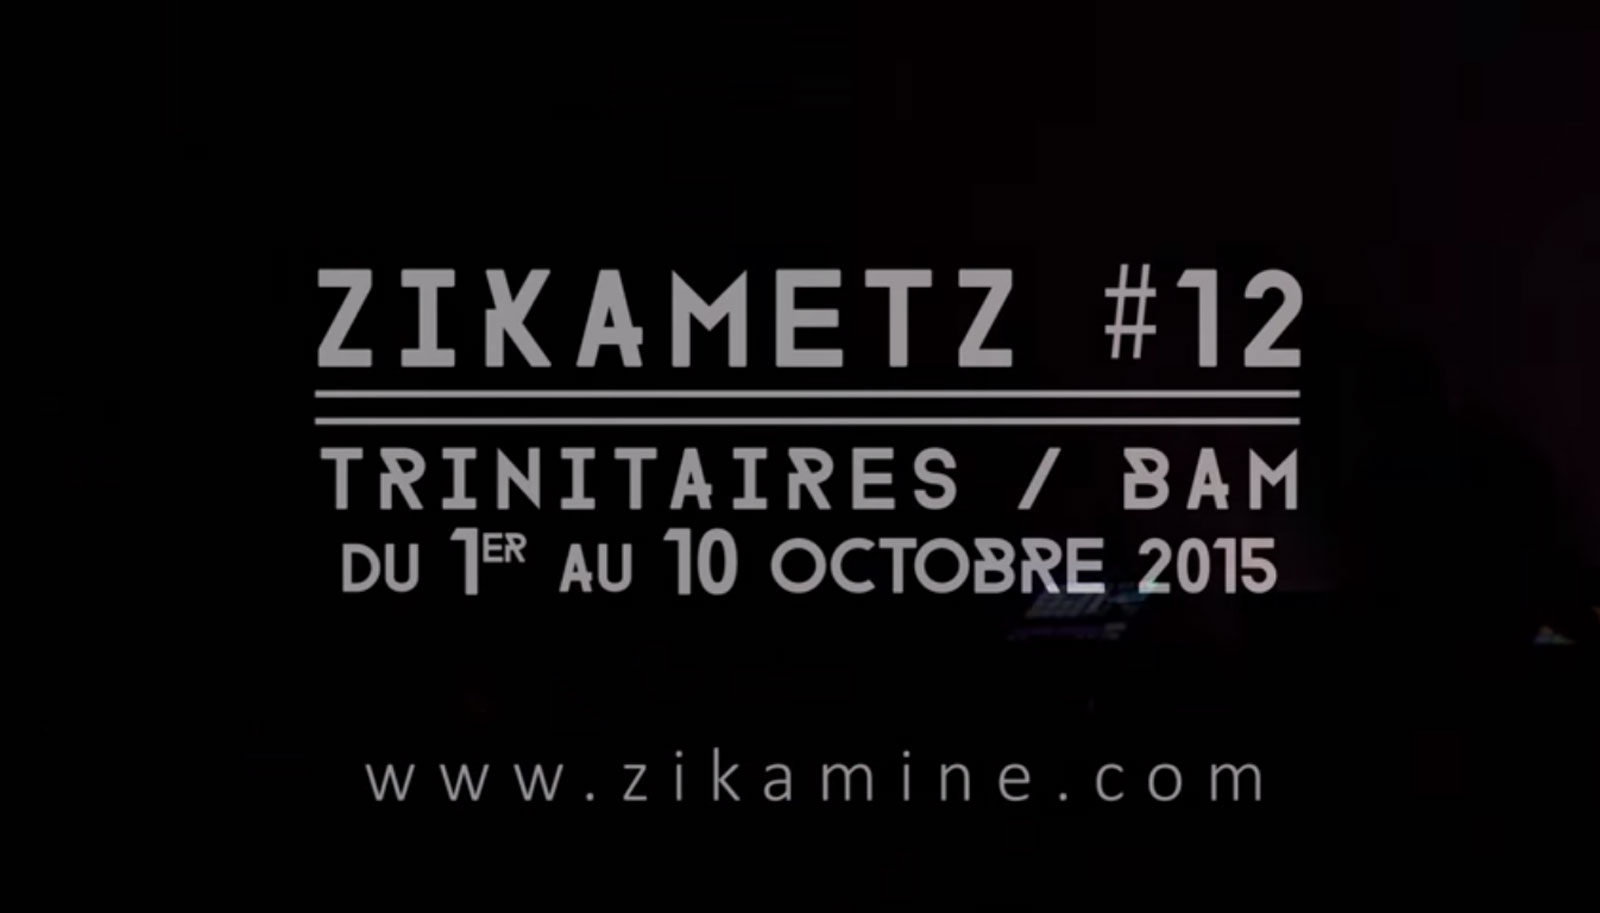 Festival Zikametz 2015 : le programme